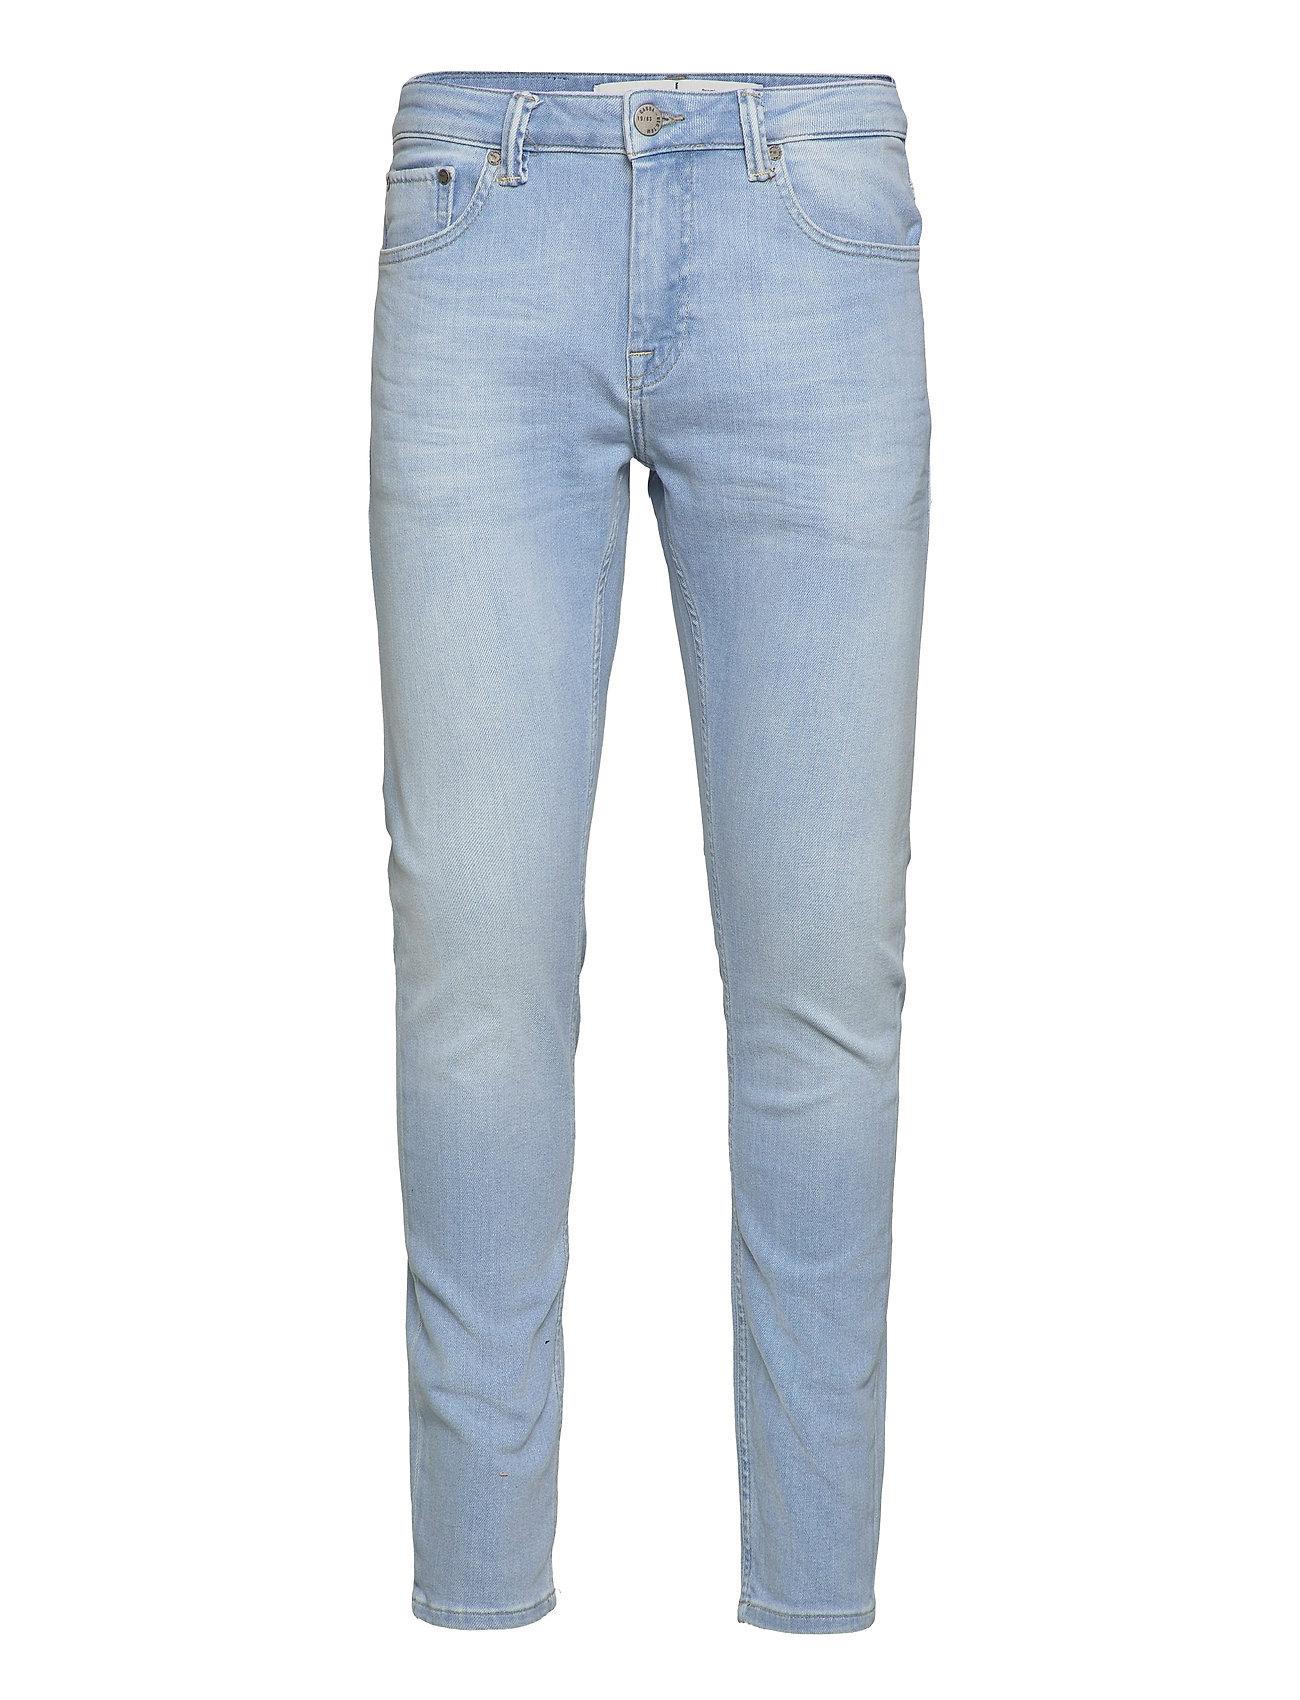 Image of J S K3897 Jeans Slim Jeans Blå Gabba (3497634581)